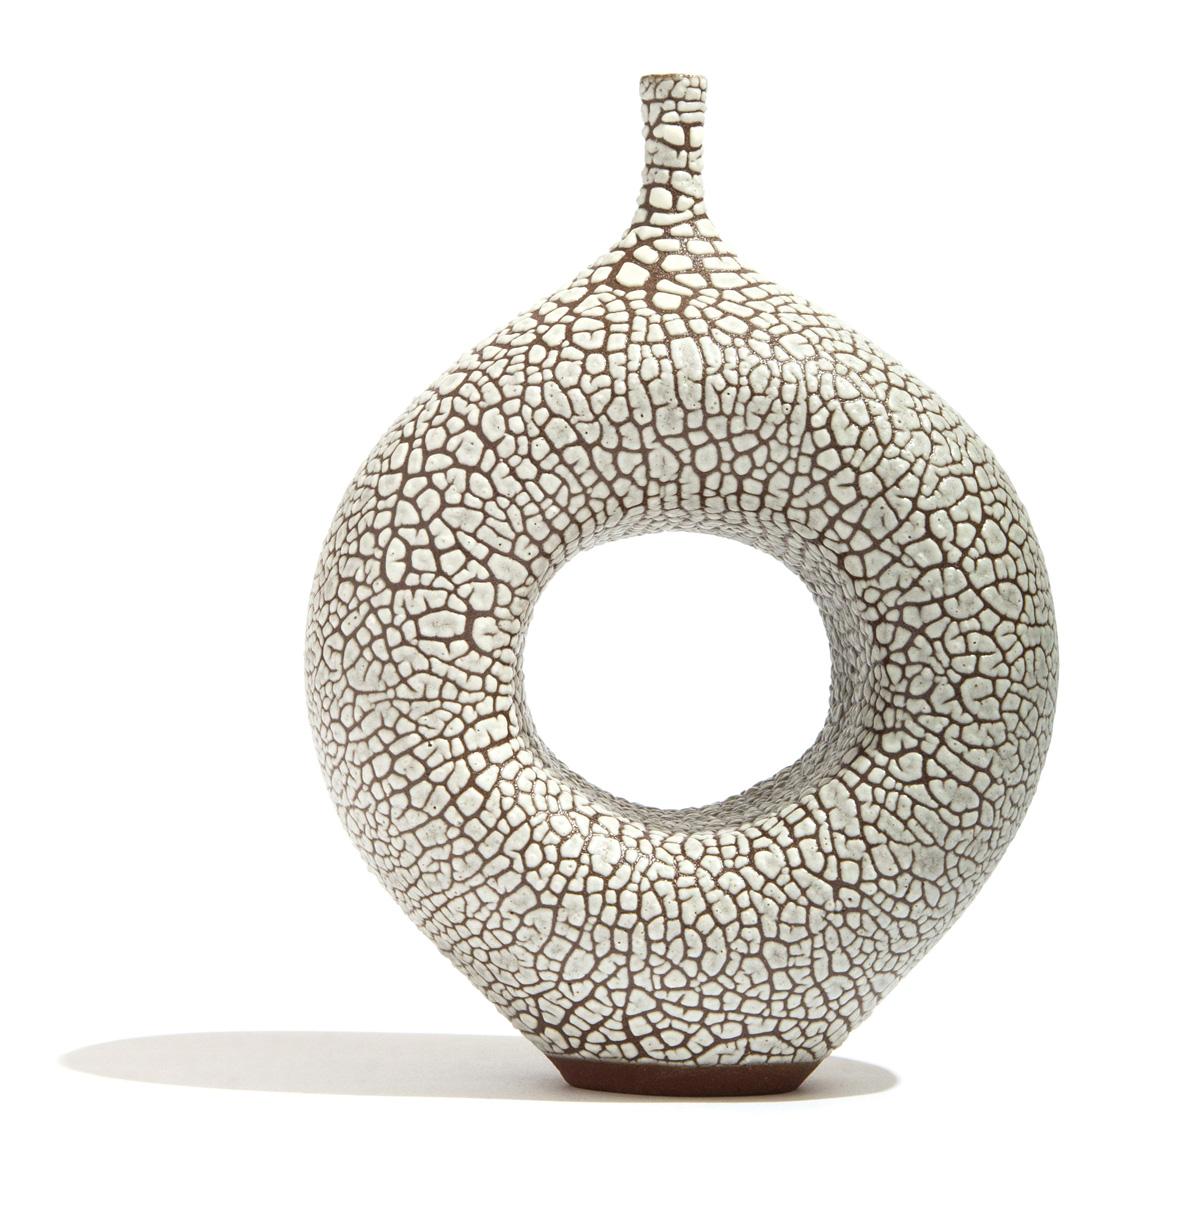 Coghlin Ceramics